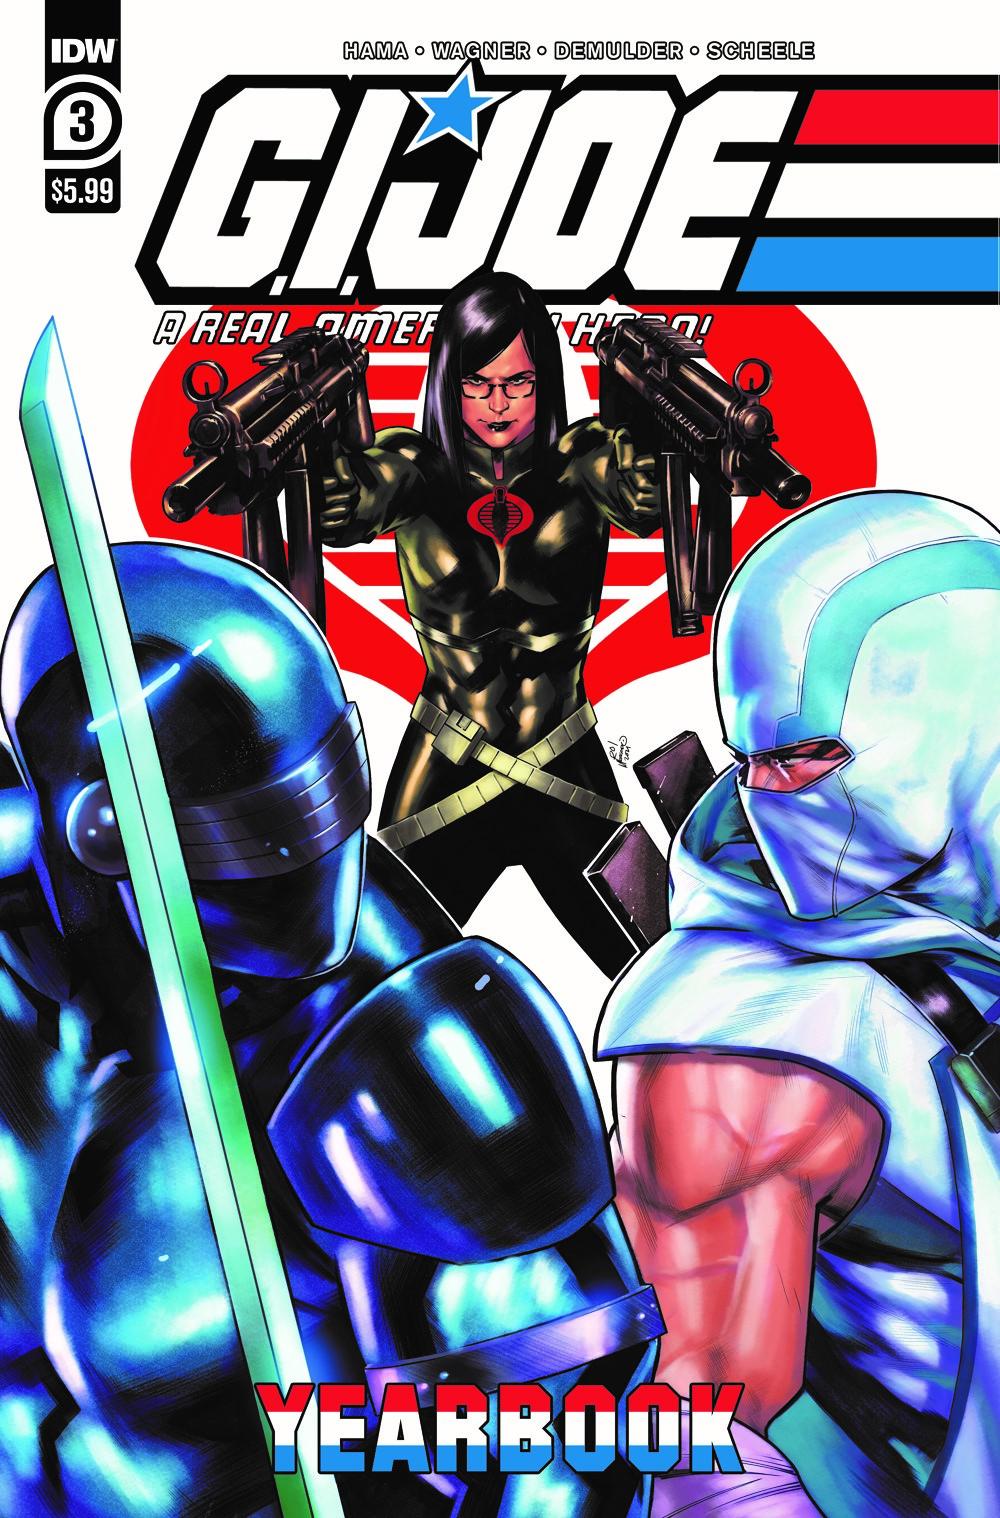 GIJoeRAH_Yearbook2021_03-cover ComicList Previews: G.I. JOE A REAL AMERICAN HERO YEARBOOK #3